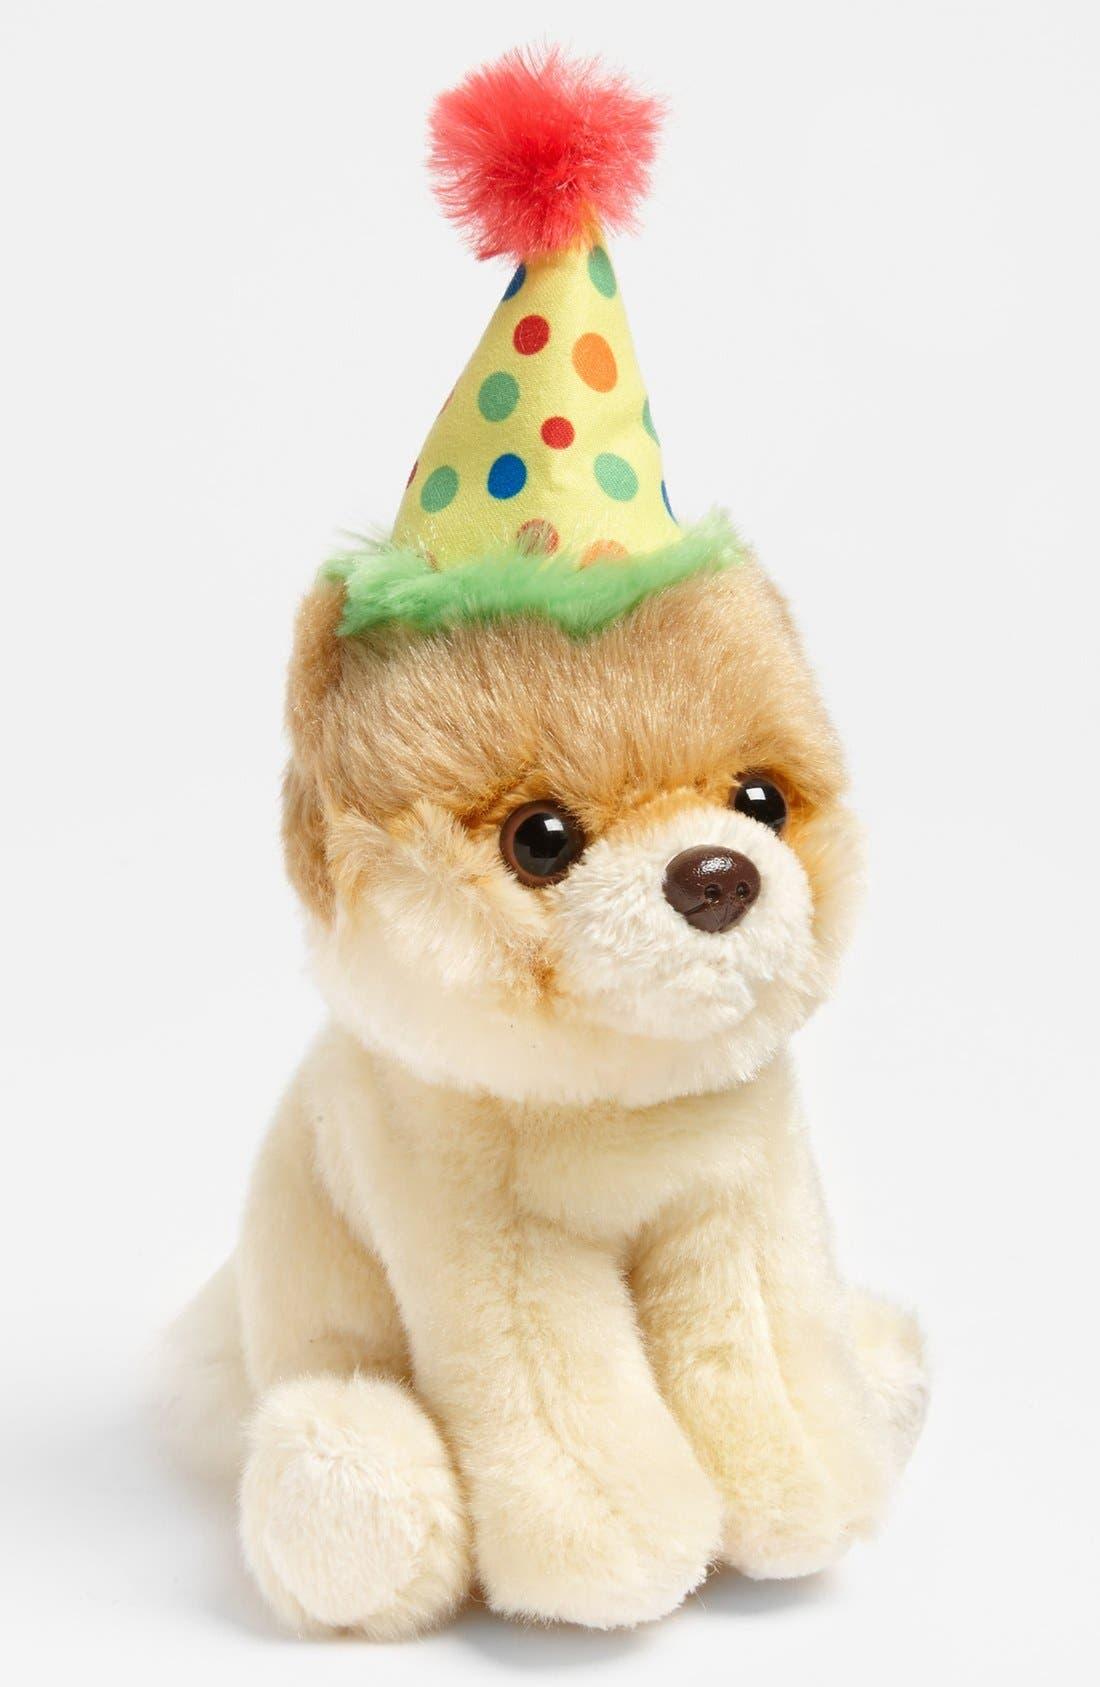 Alternate Image 1 Selected - Gund 'Itty Bitty Boo - Happy Birthday' Stuffed Animal